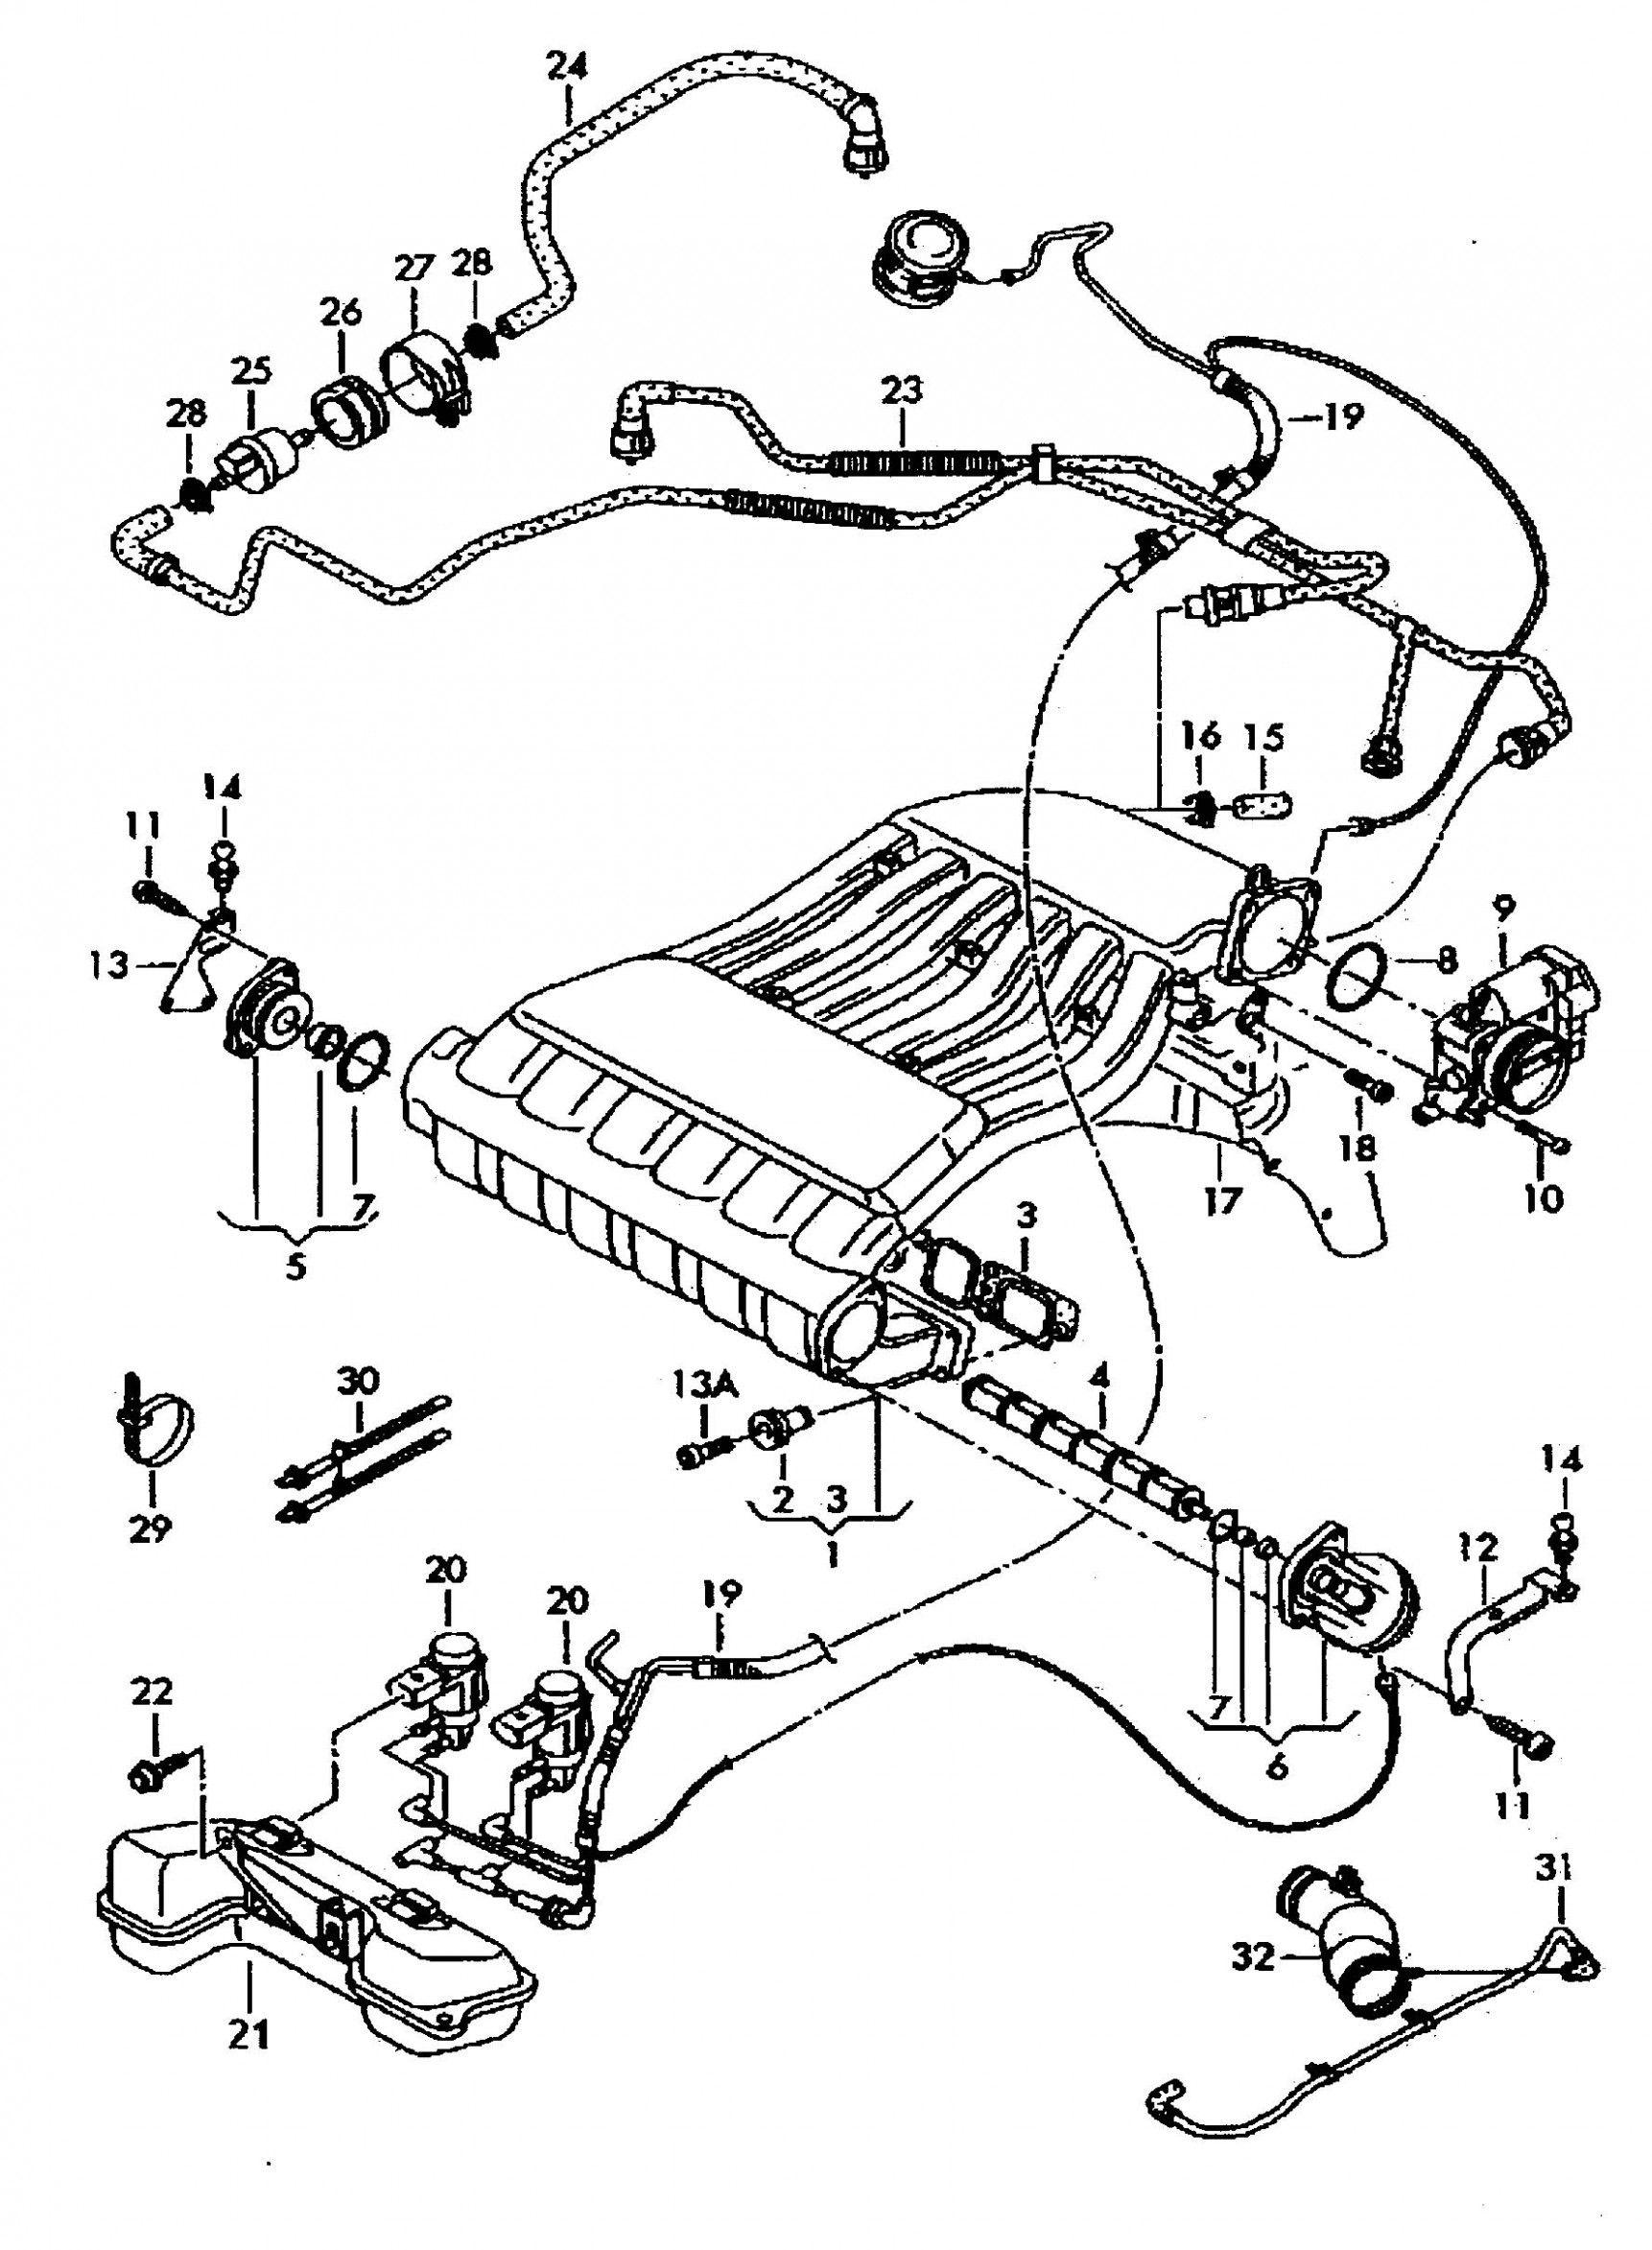 Engine Diagram 6 Jetta Hdi Engine Diagram 6 Jetta Hdi